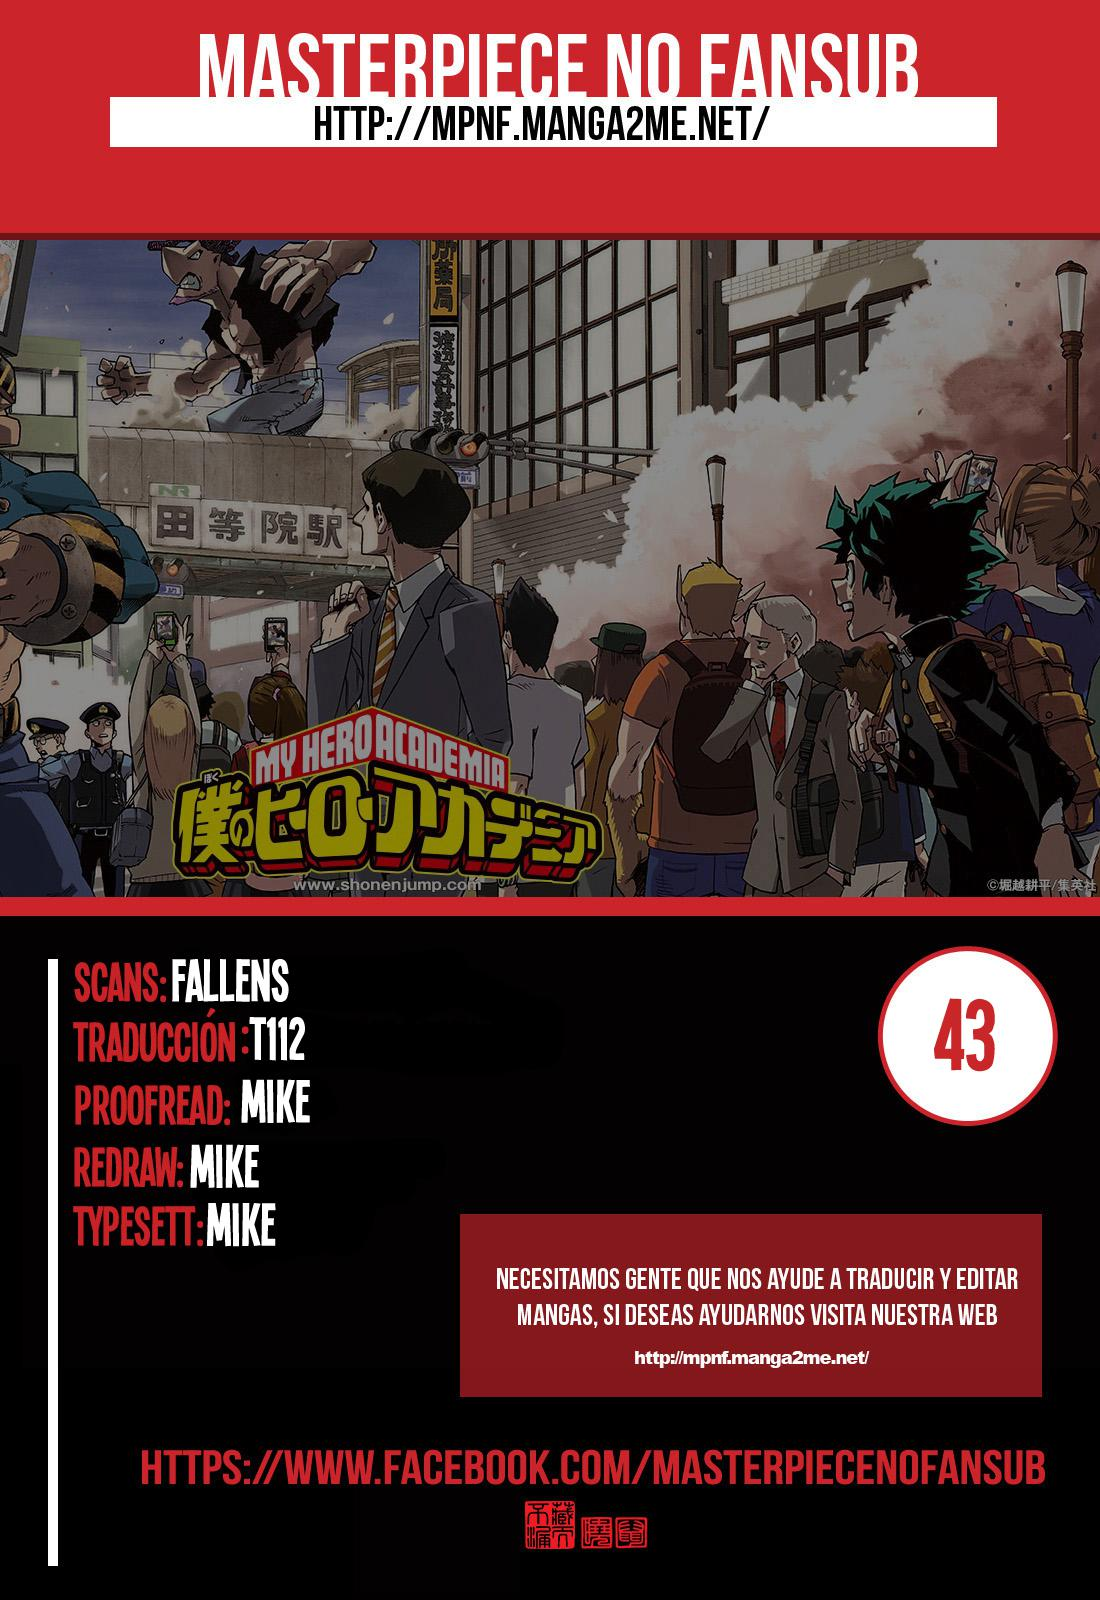 http://c5.ninemanga.com/es_manga/54/182/378635/fd68303242a2e47ac17ac1ae54692310.jpg Page 1